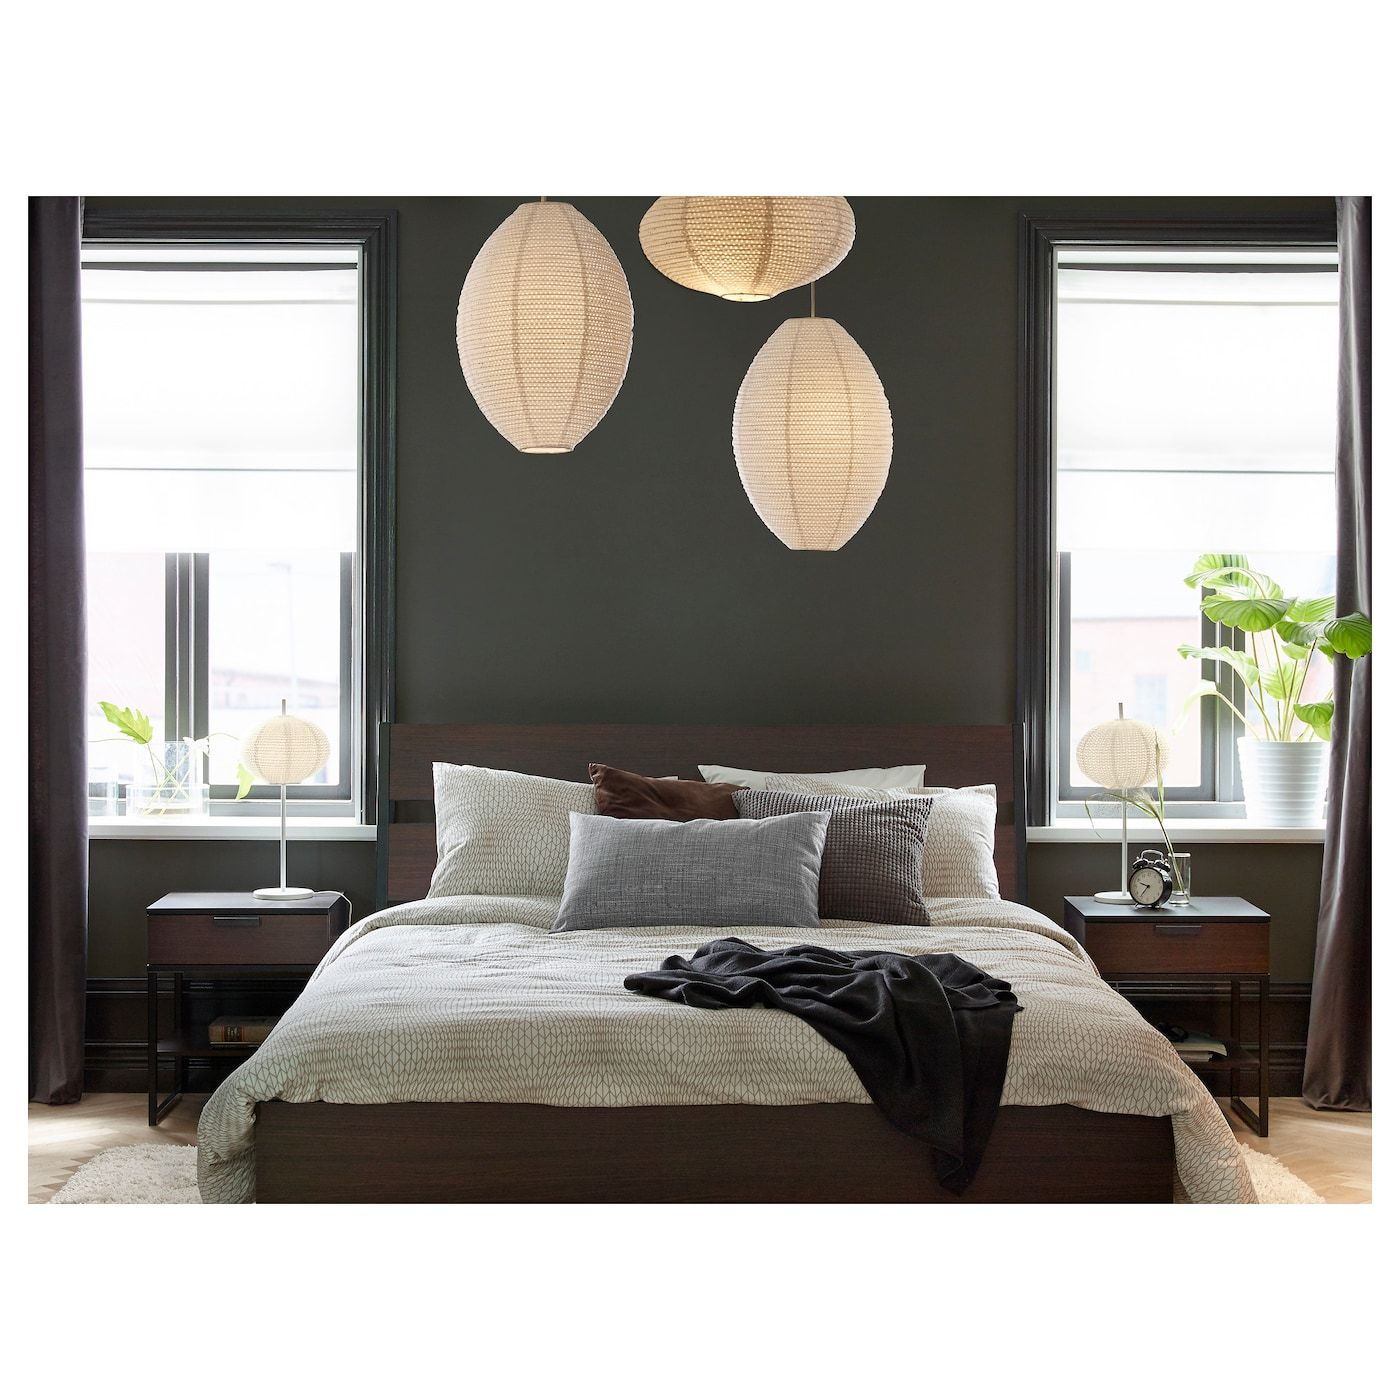 TRYSIL Bed frame, dark brown, Luröy, Queen, Mattress